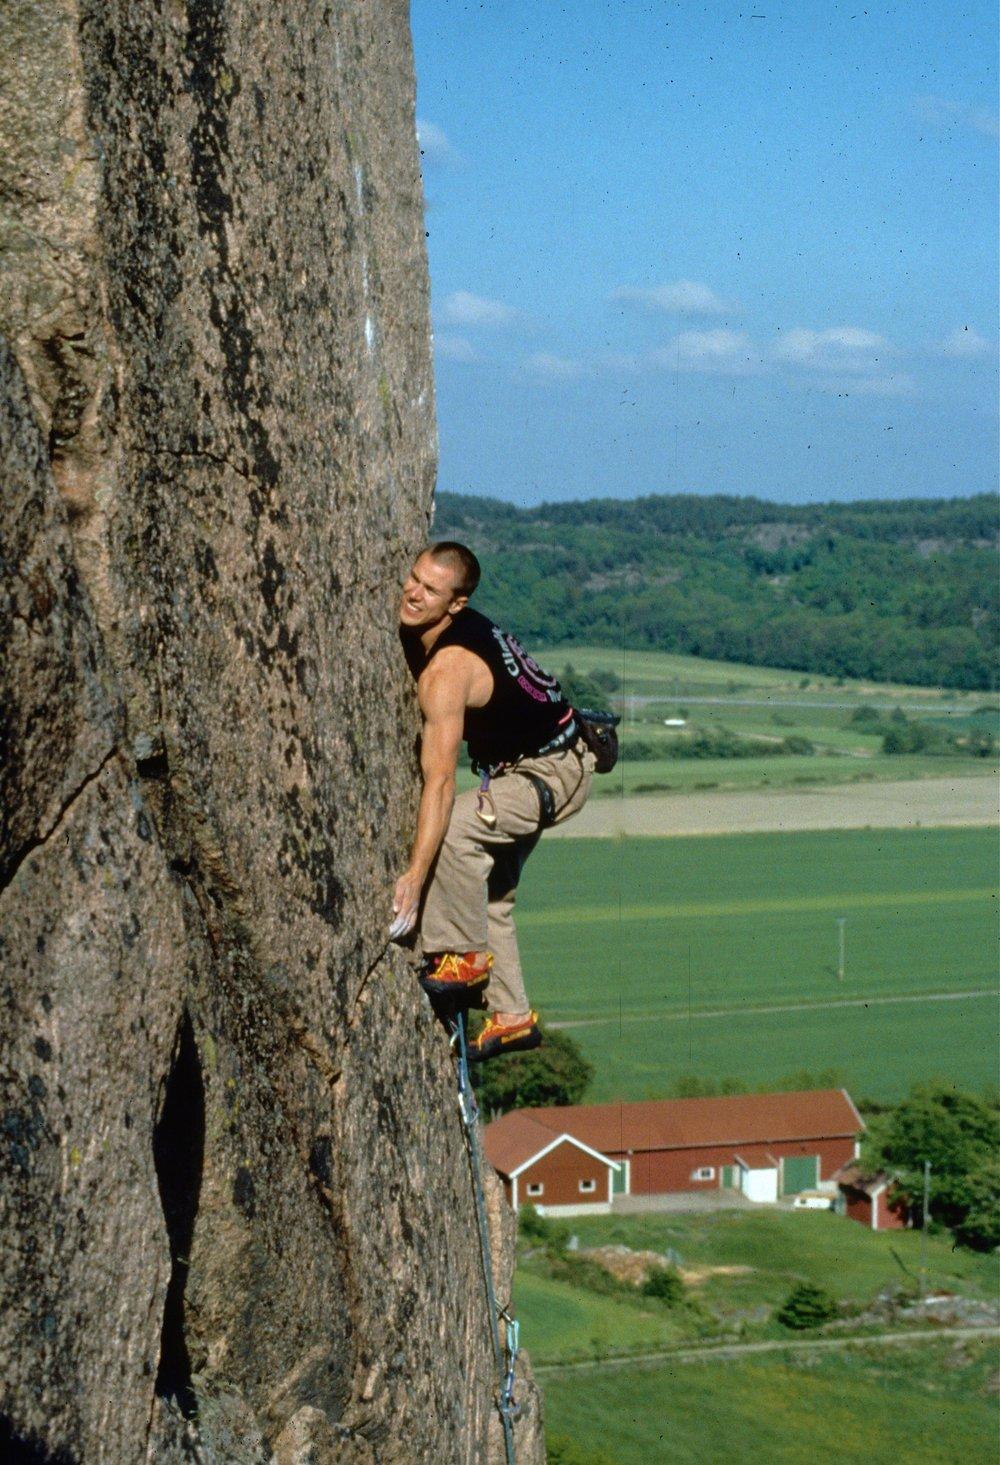 Post Modern Arete E6 6c, Halle. First ascent in 1999.  Photo: Gresham collection